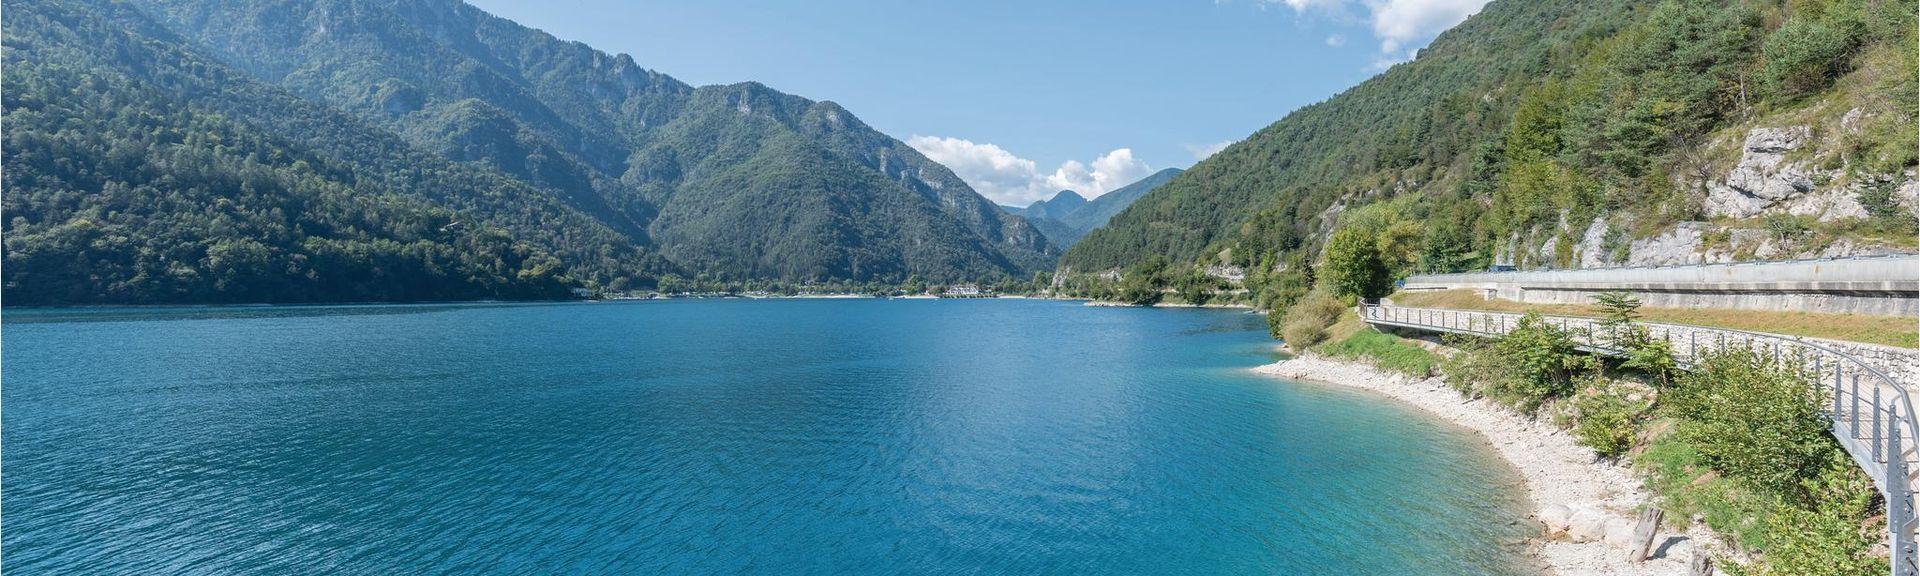 Fiavè, Trento, Trentino-Alto Adige/South Tyrol, Italy